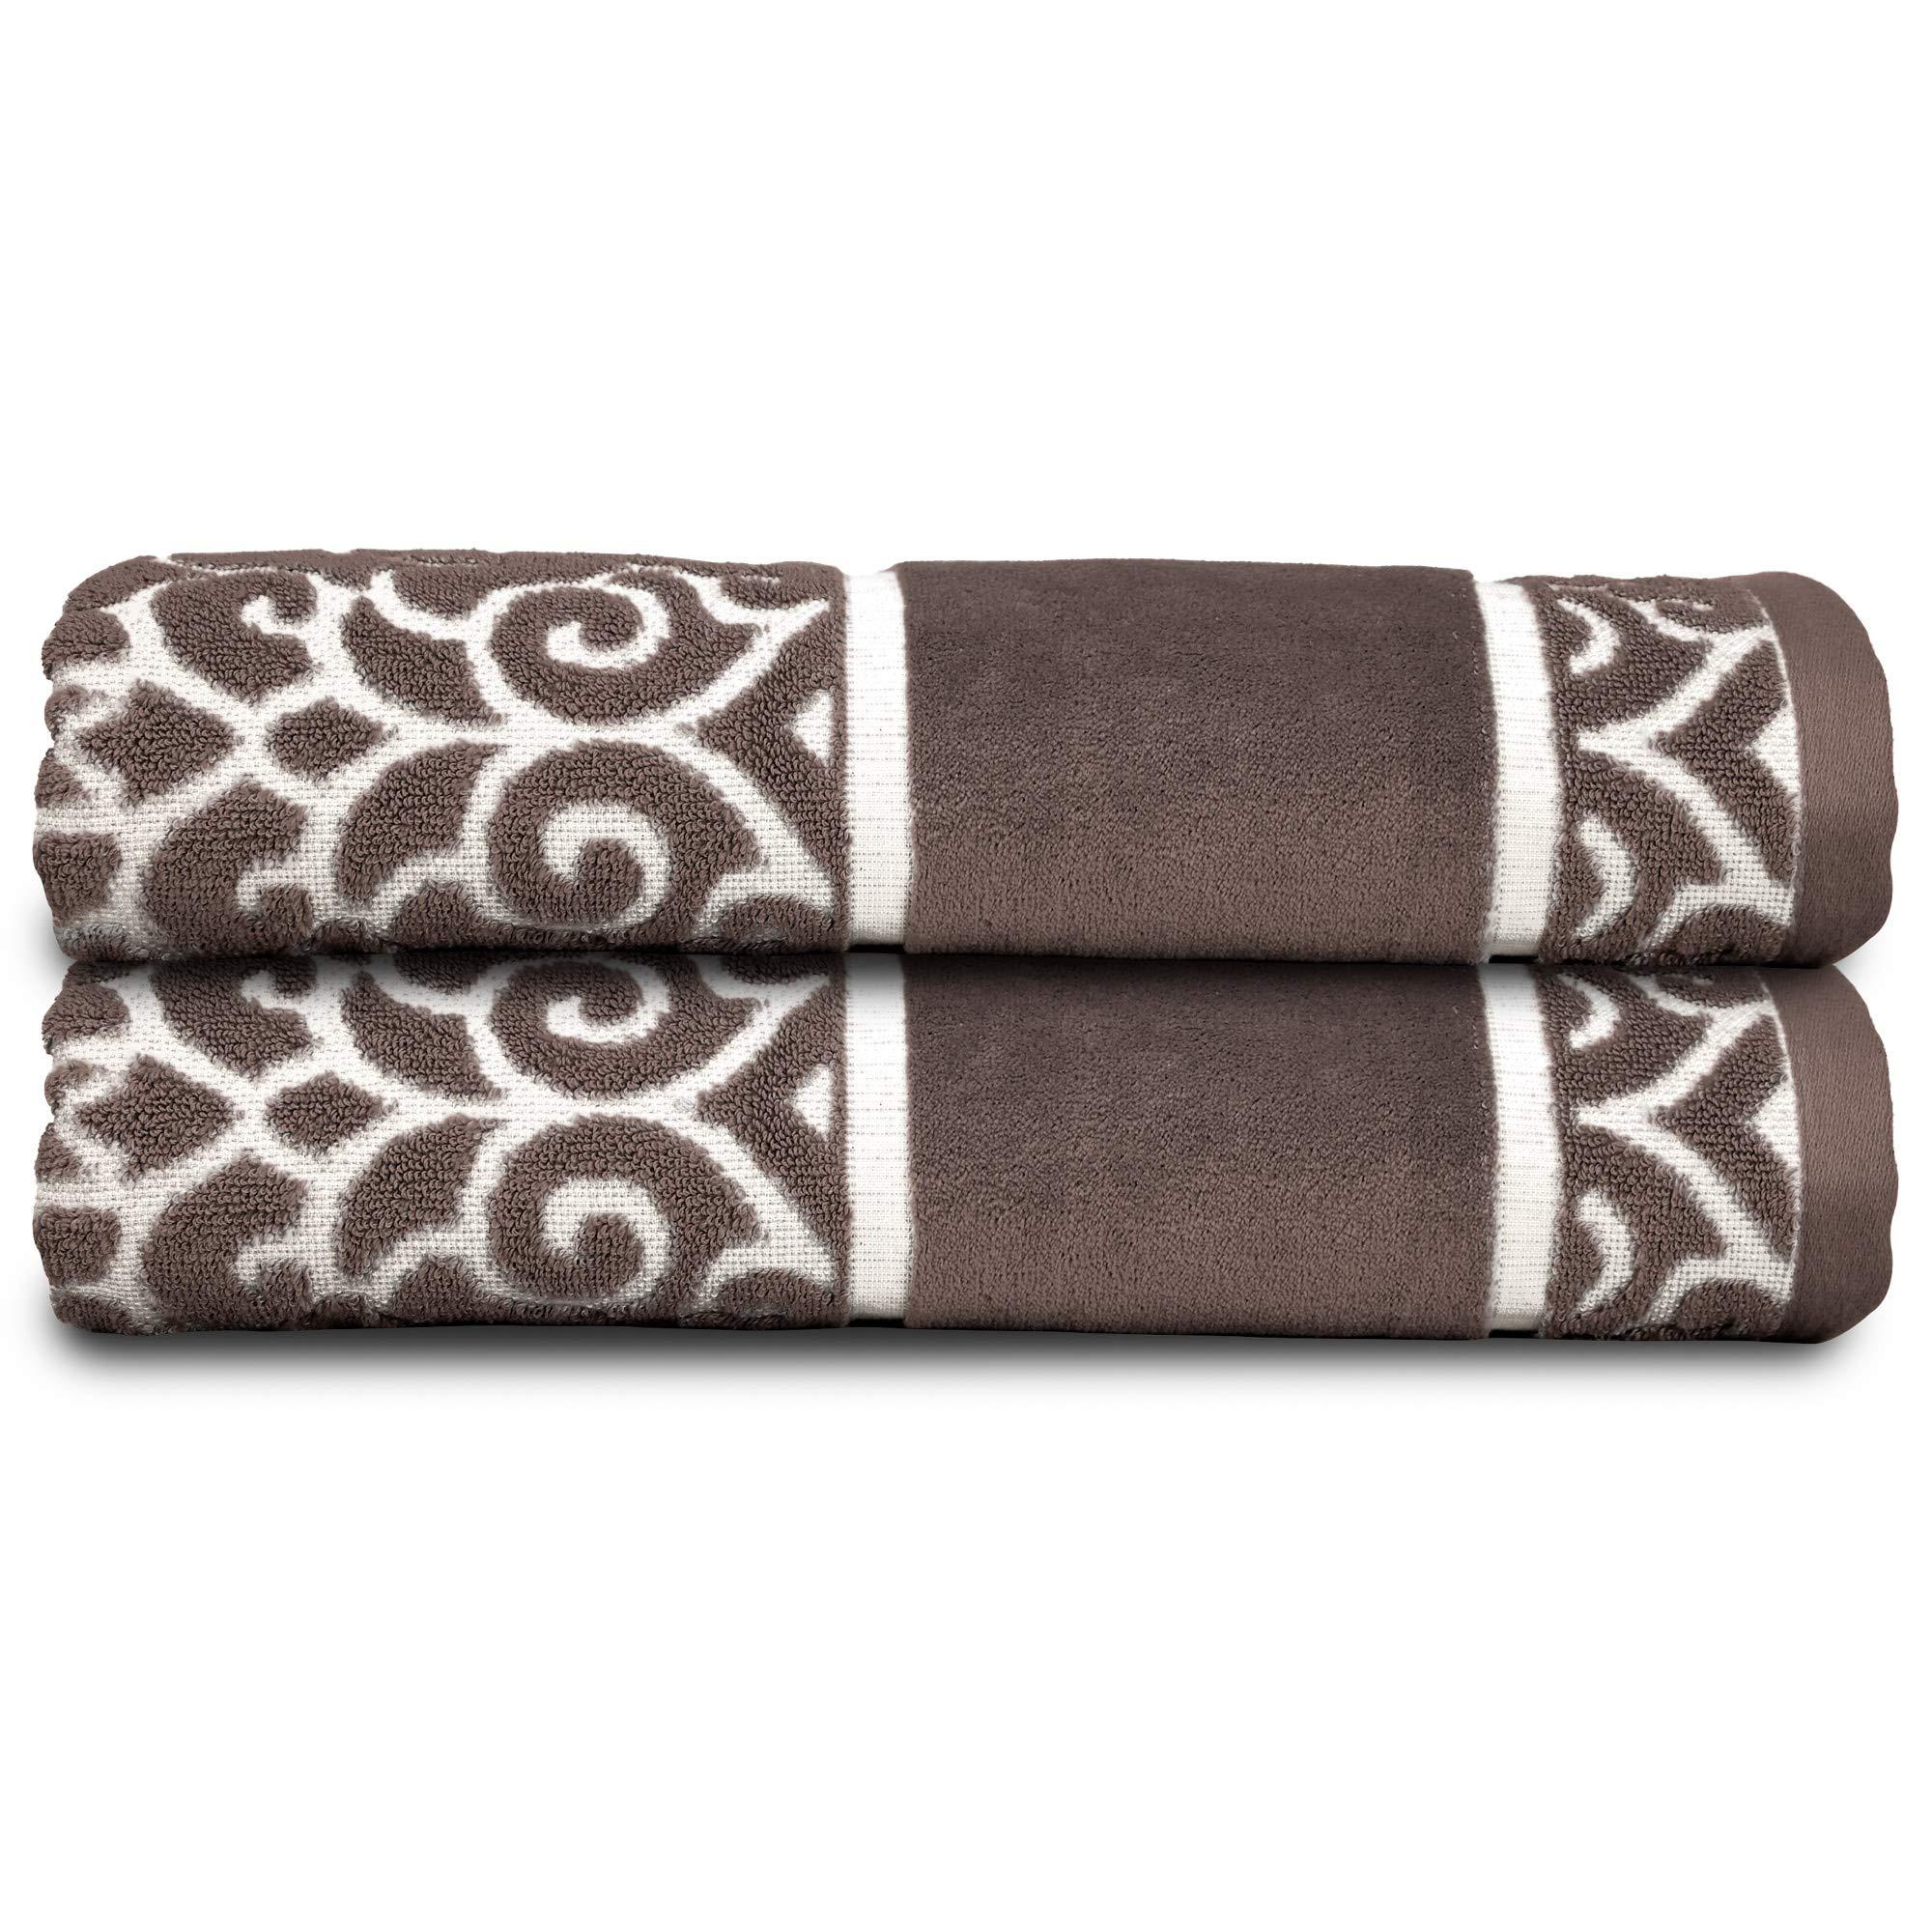 Soft Textilz Elegant 2 Piece Lightweight Luxury Bath Towels - Premium European Decorative & Absorbent - Fancy Home/Guest Bathroom Cotton Towel 51'' x 27'' - Charm Design Brown